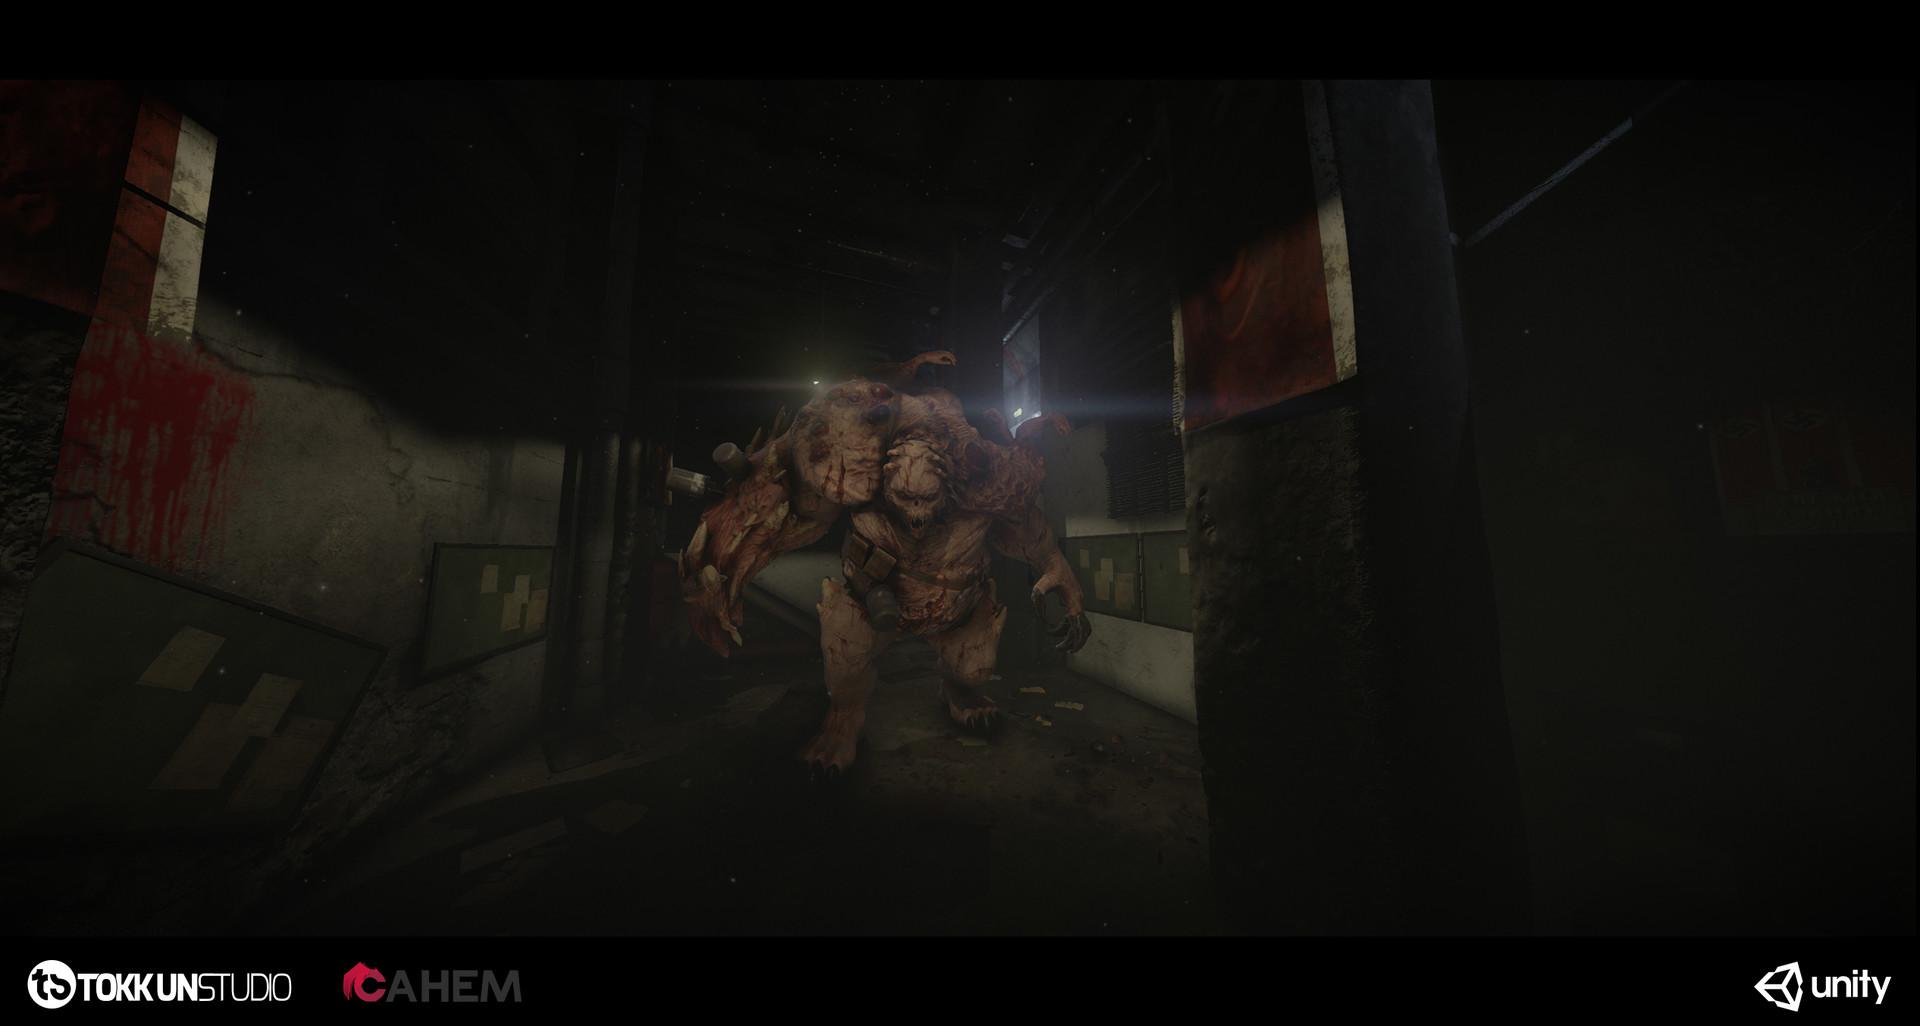 Tokkun studio bunker shot 23